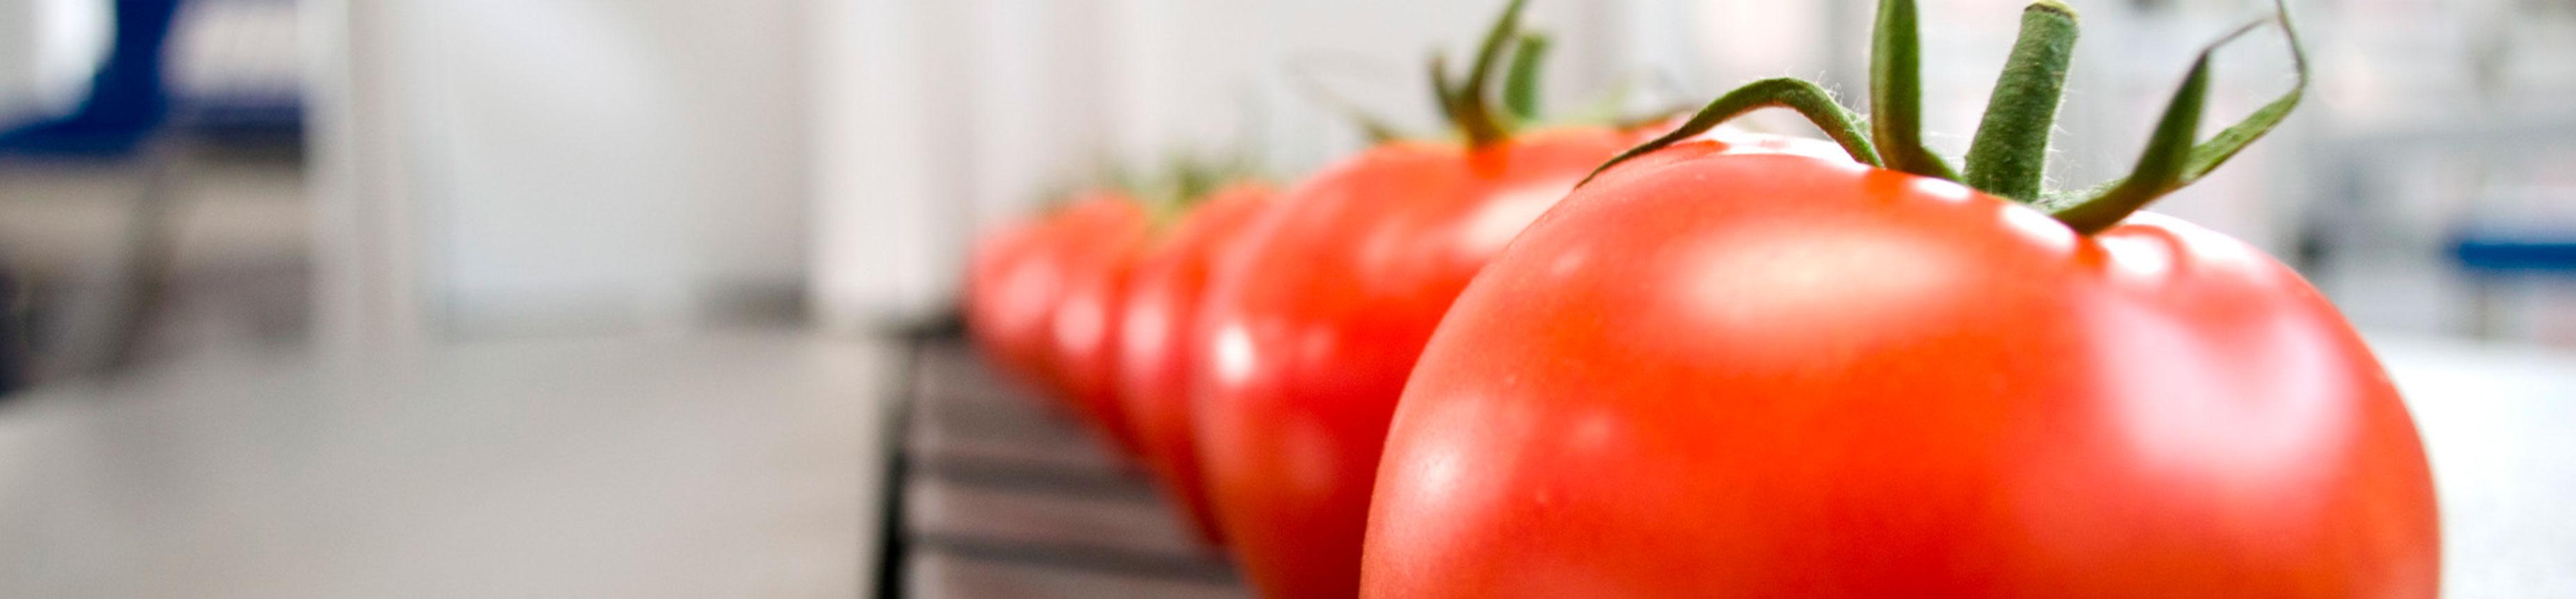 coronavirus en industrias agroalimentarias alimentos